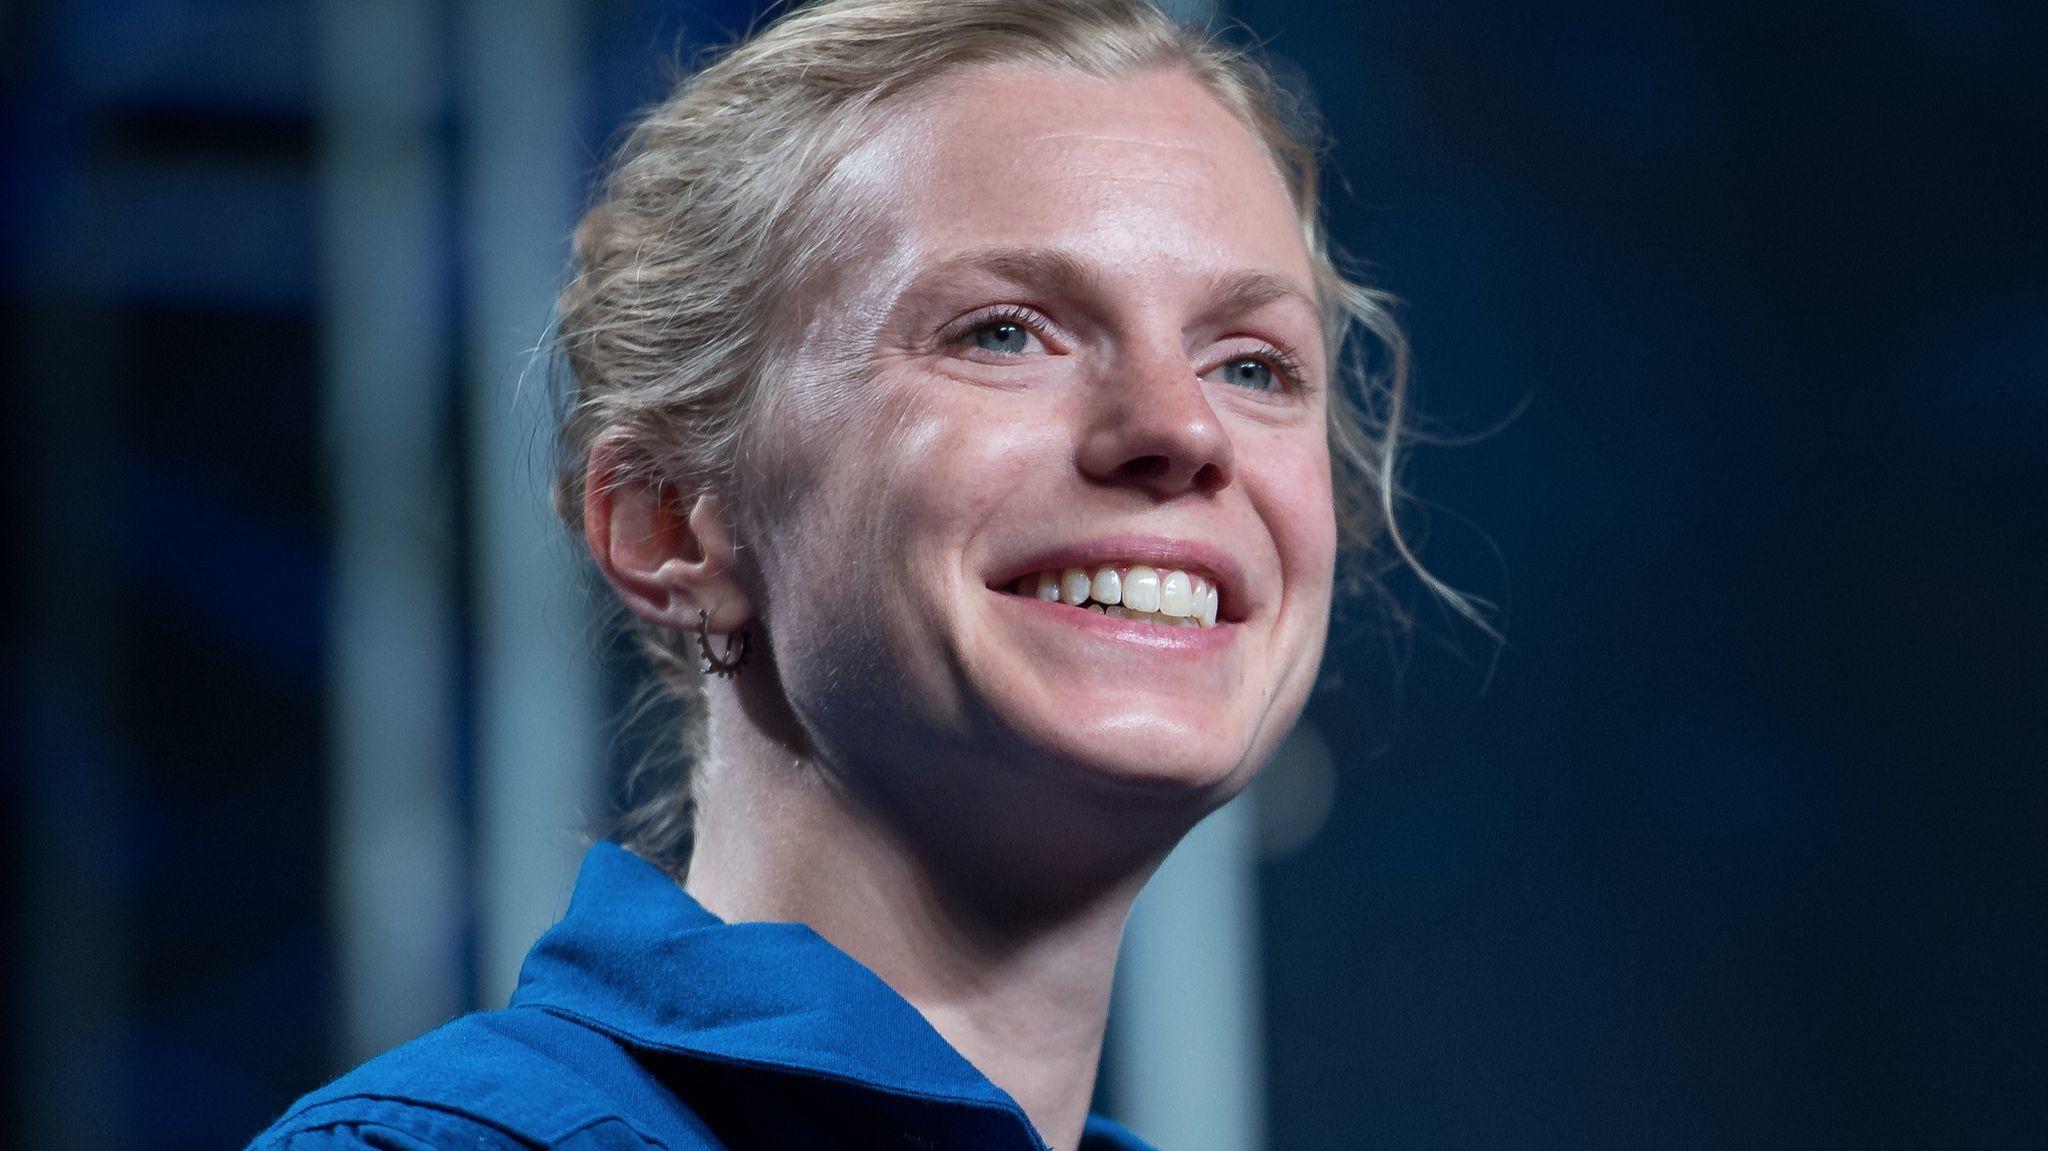 Astronaut Candidate Zena Cardman